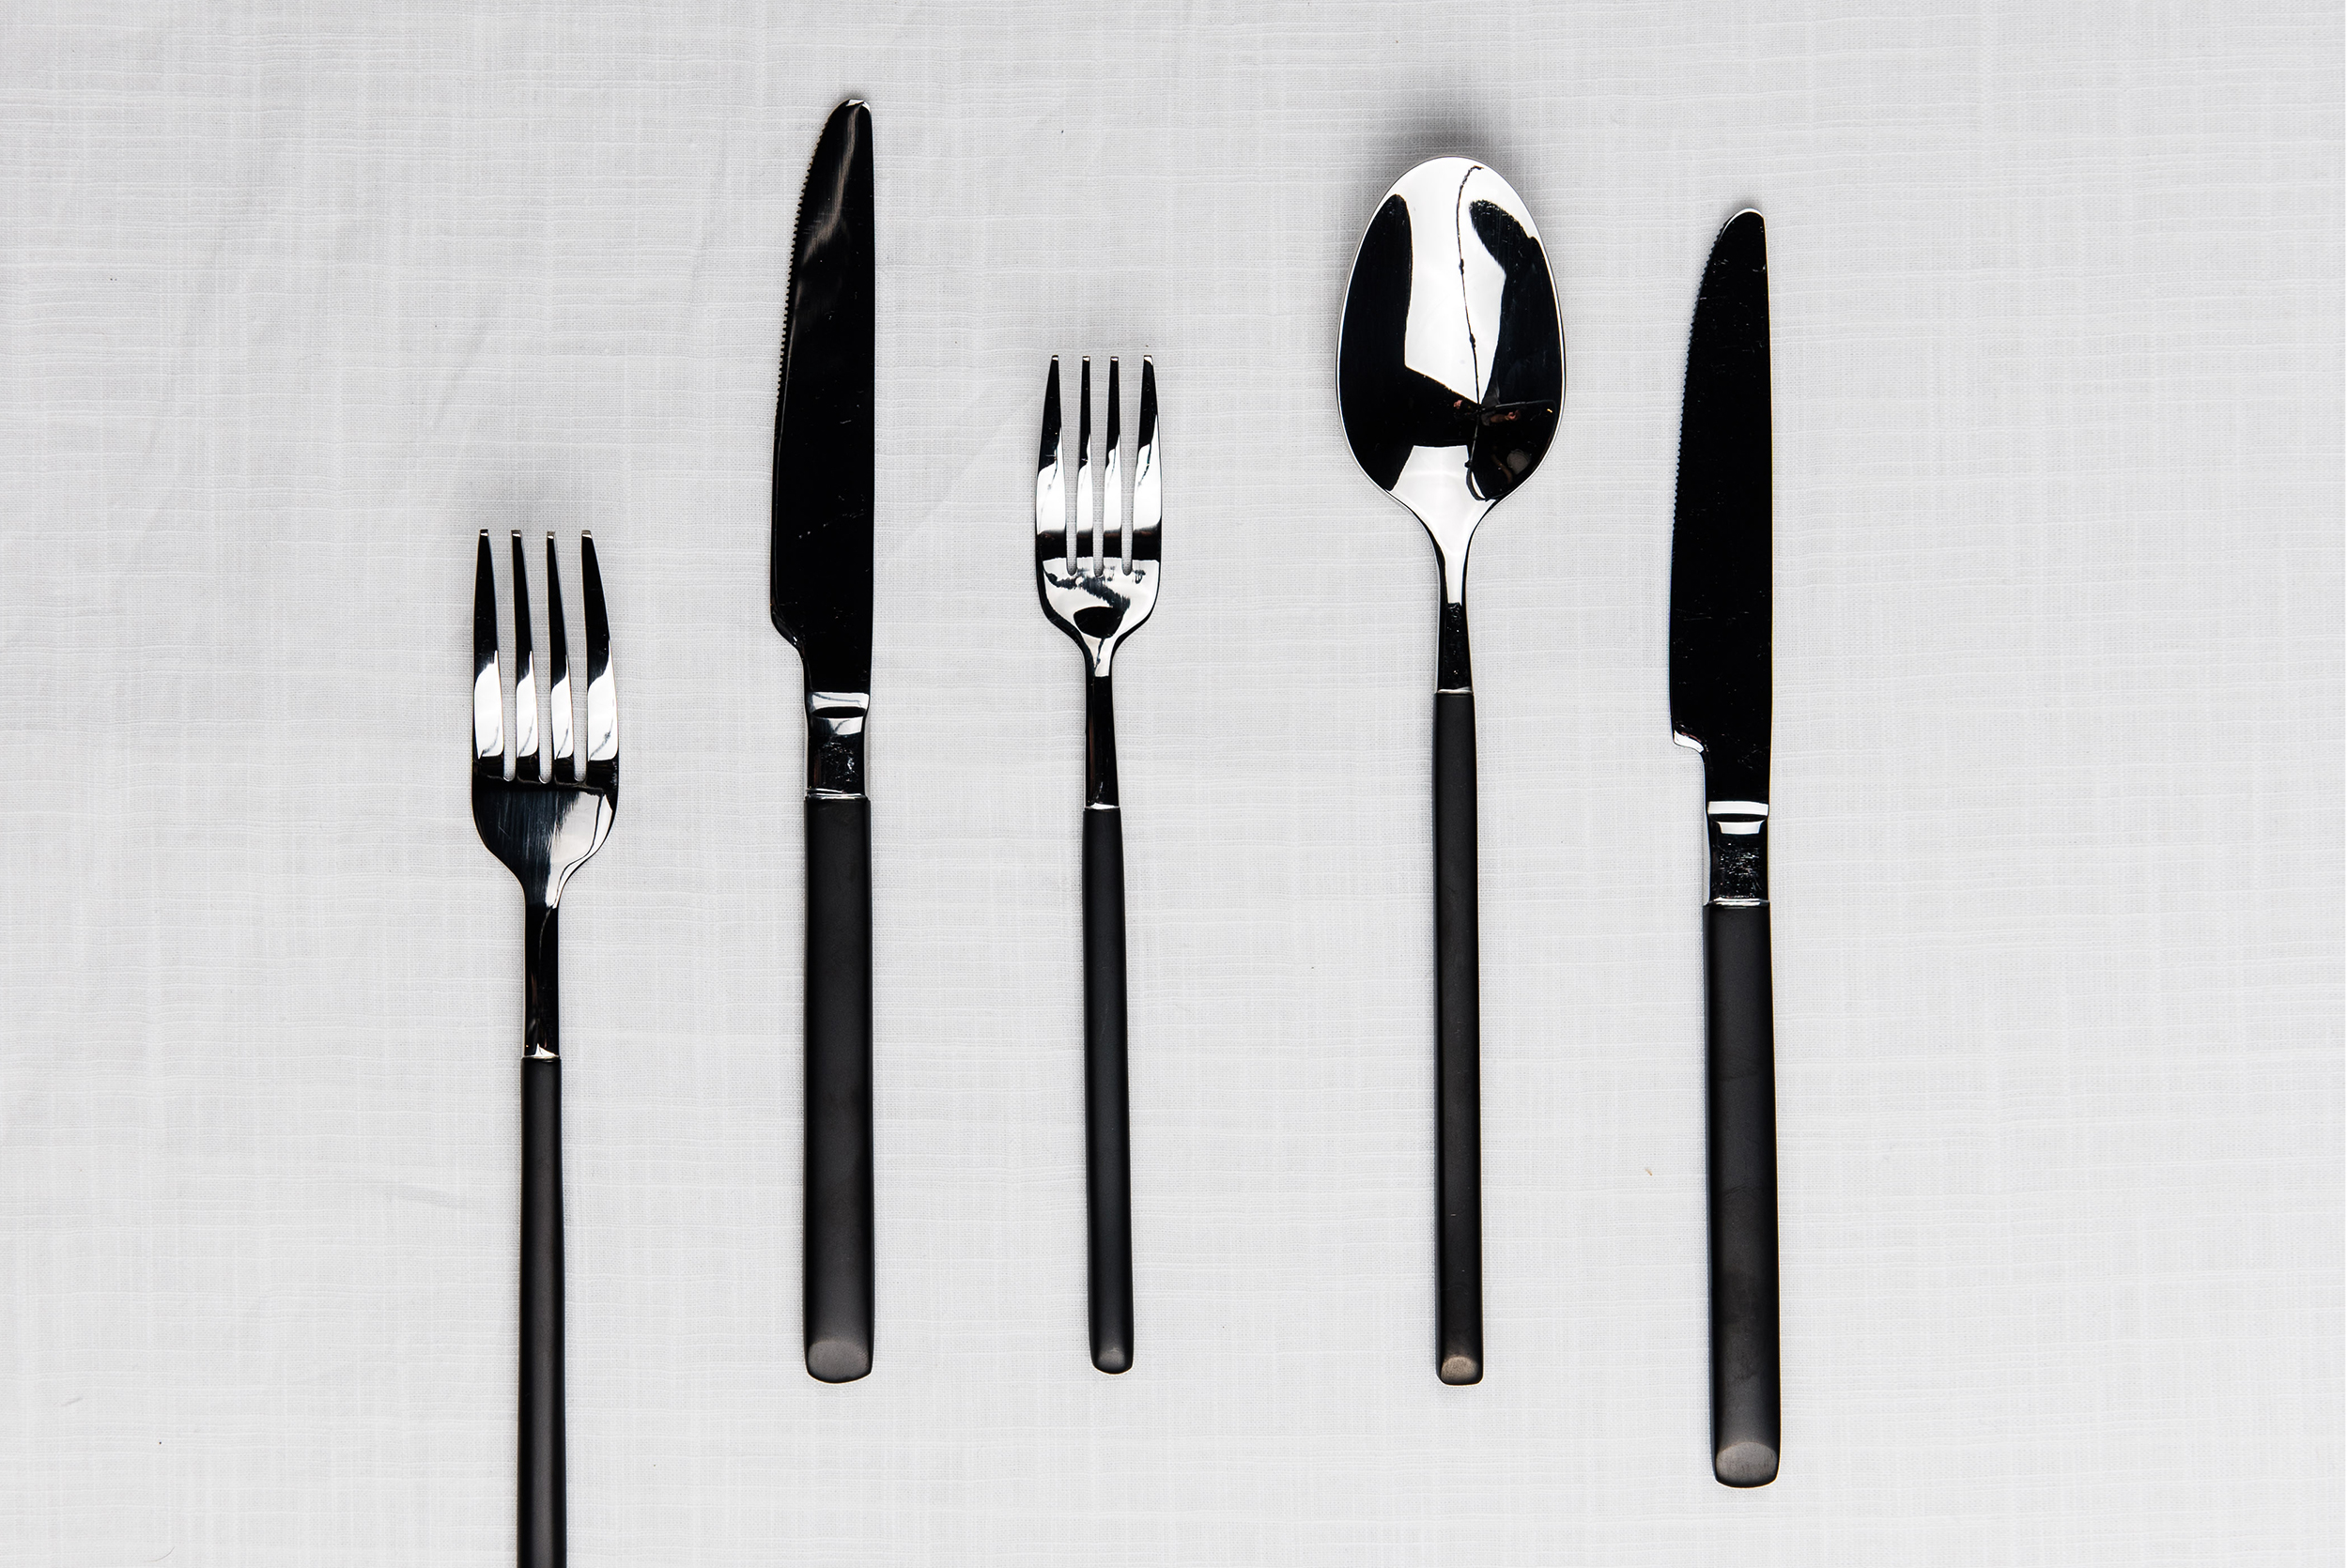 044-Black-Silver-Flatware.jpg